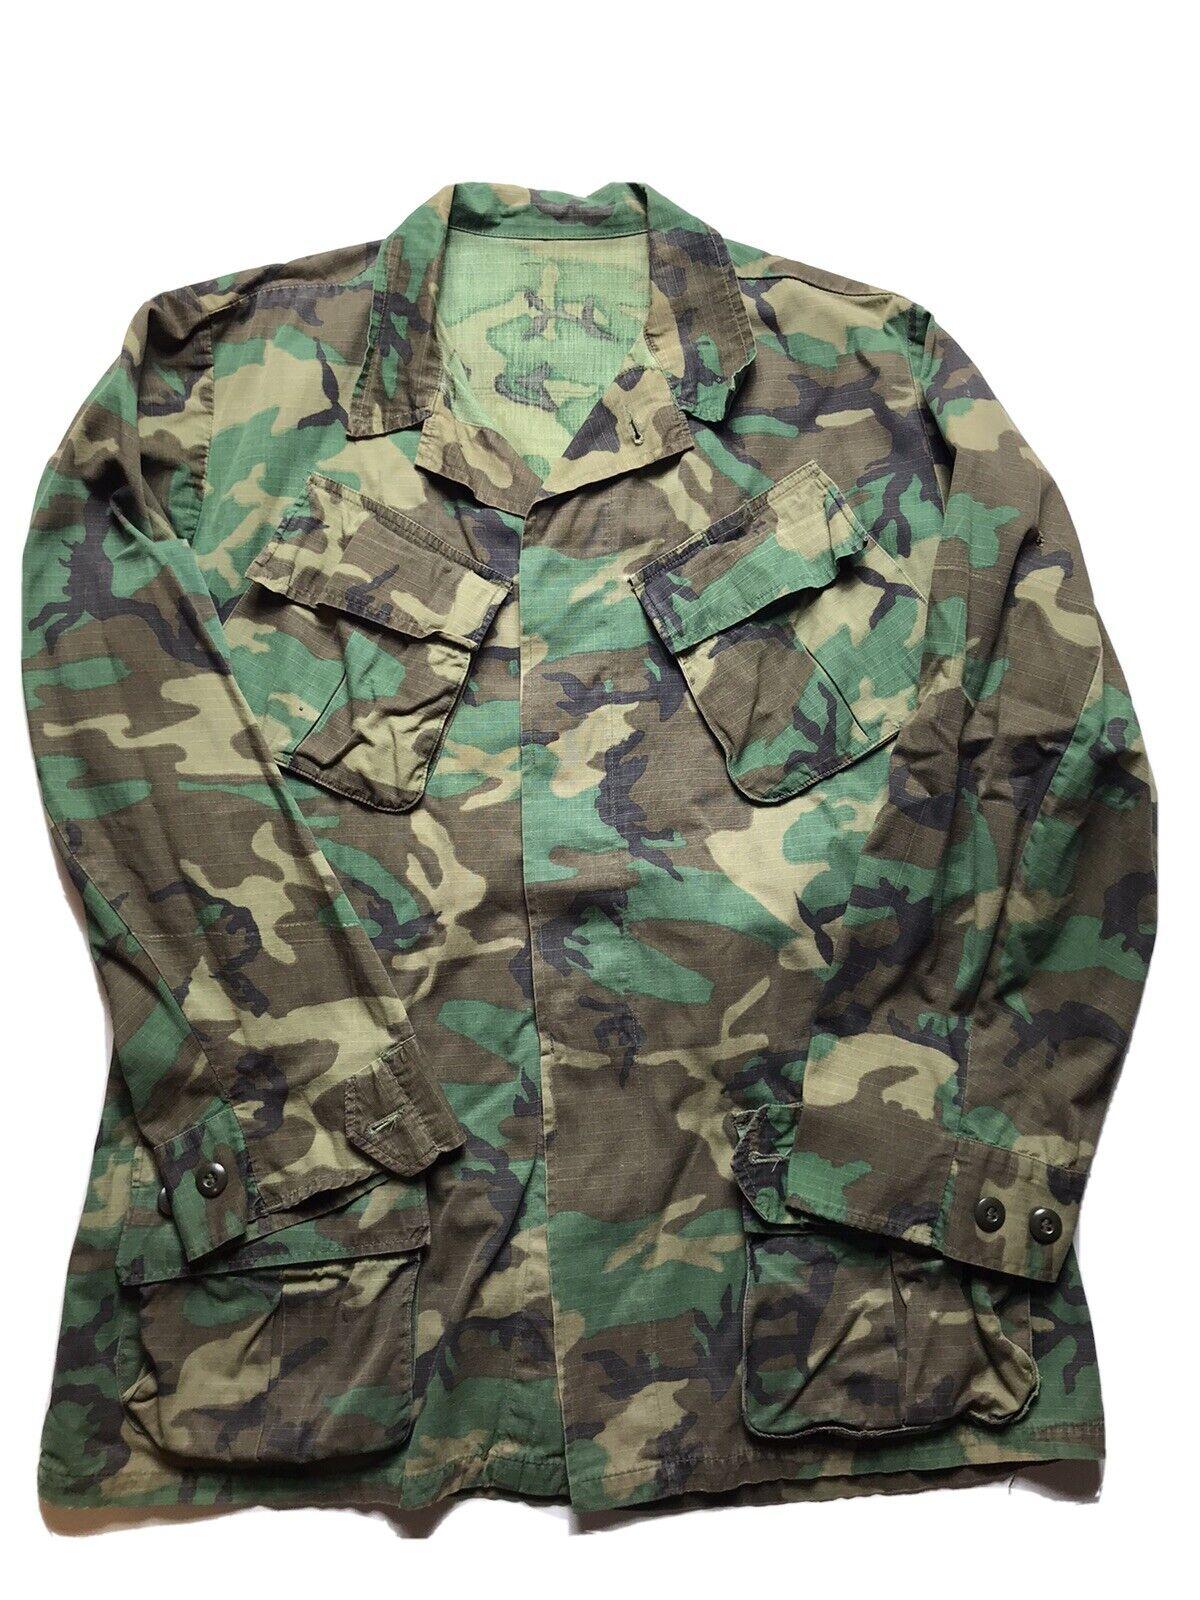 Vintage 70s era Marines camouflage shirt USMC Rip stop Cotton tropical Parka Green Cargo pockets military coat S M